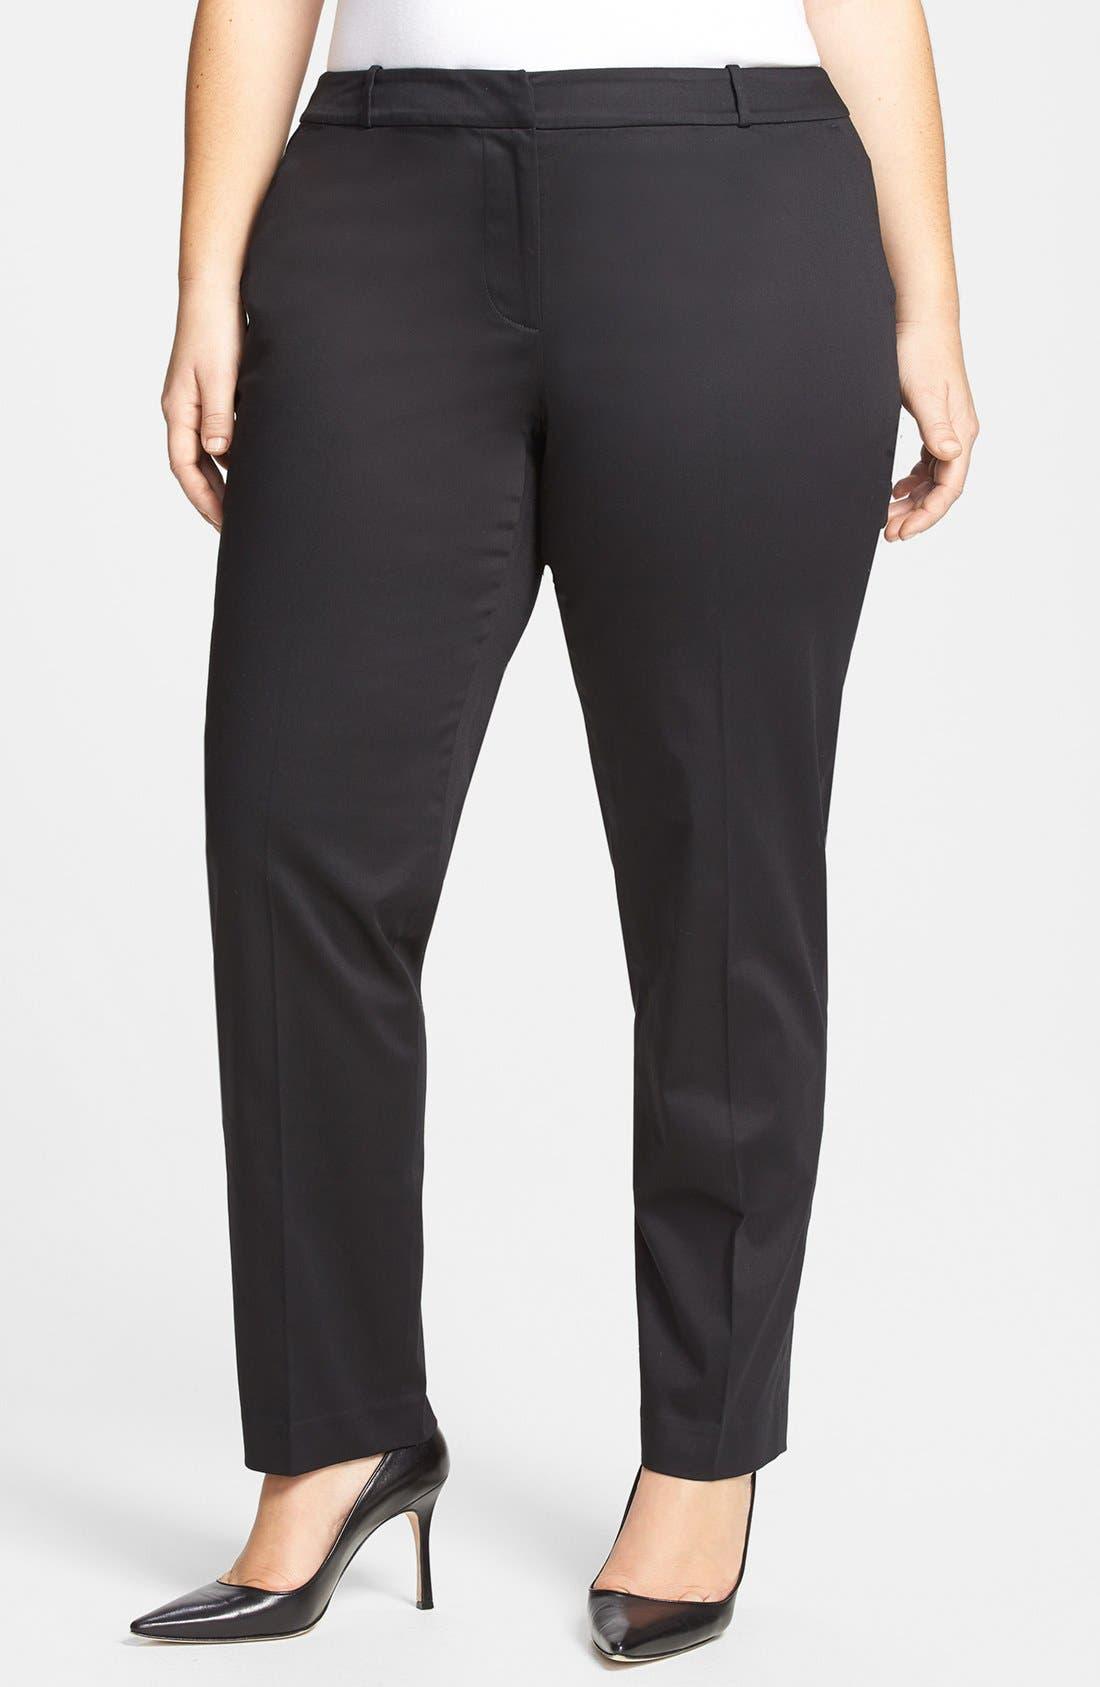 Alternate Image 1 Selected - MICHAEL Michael Kors 'Welles' Stretch Cotton Sateen Ankle Pants (Plus Size)